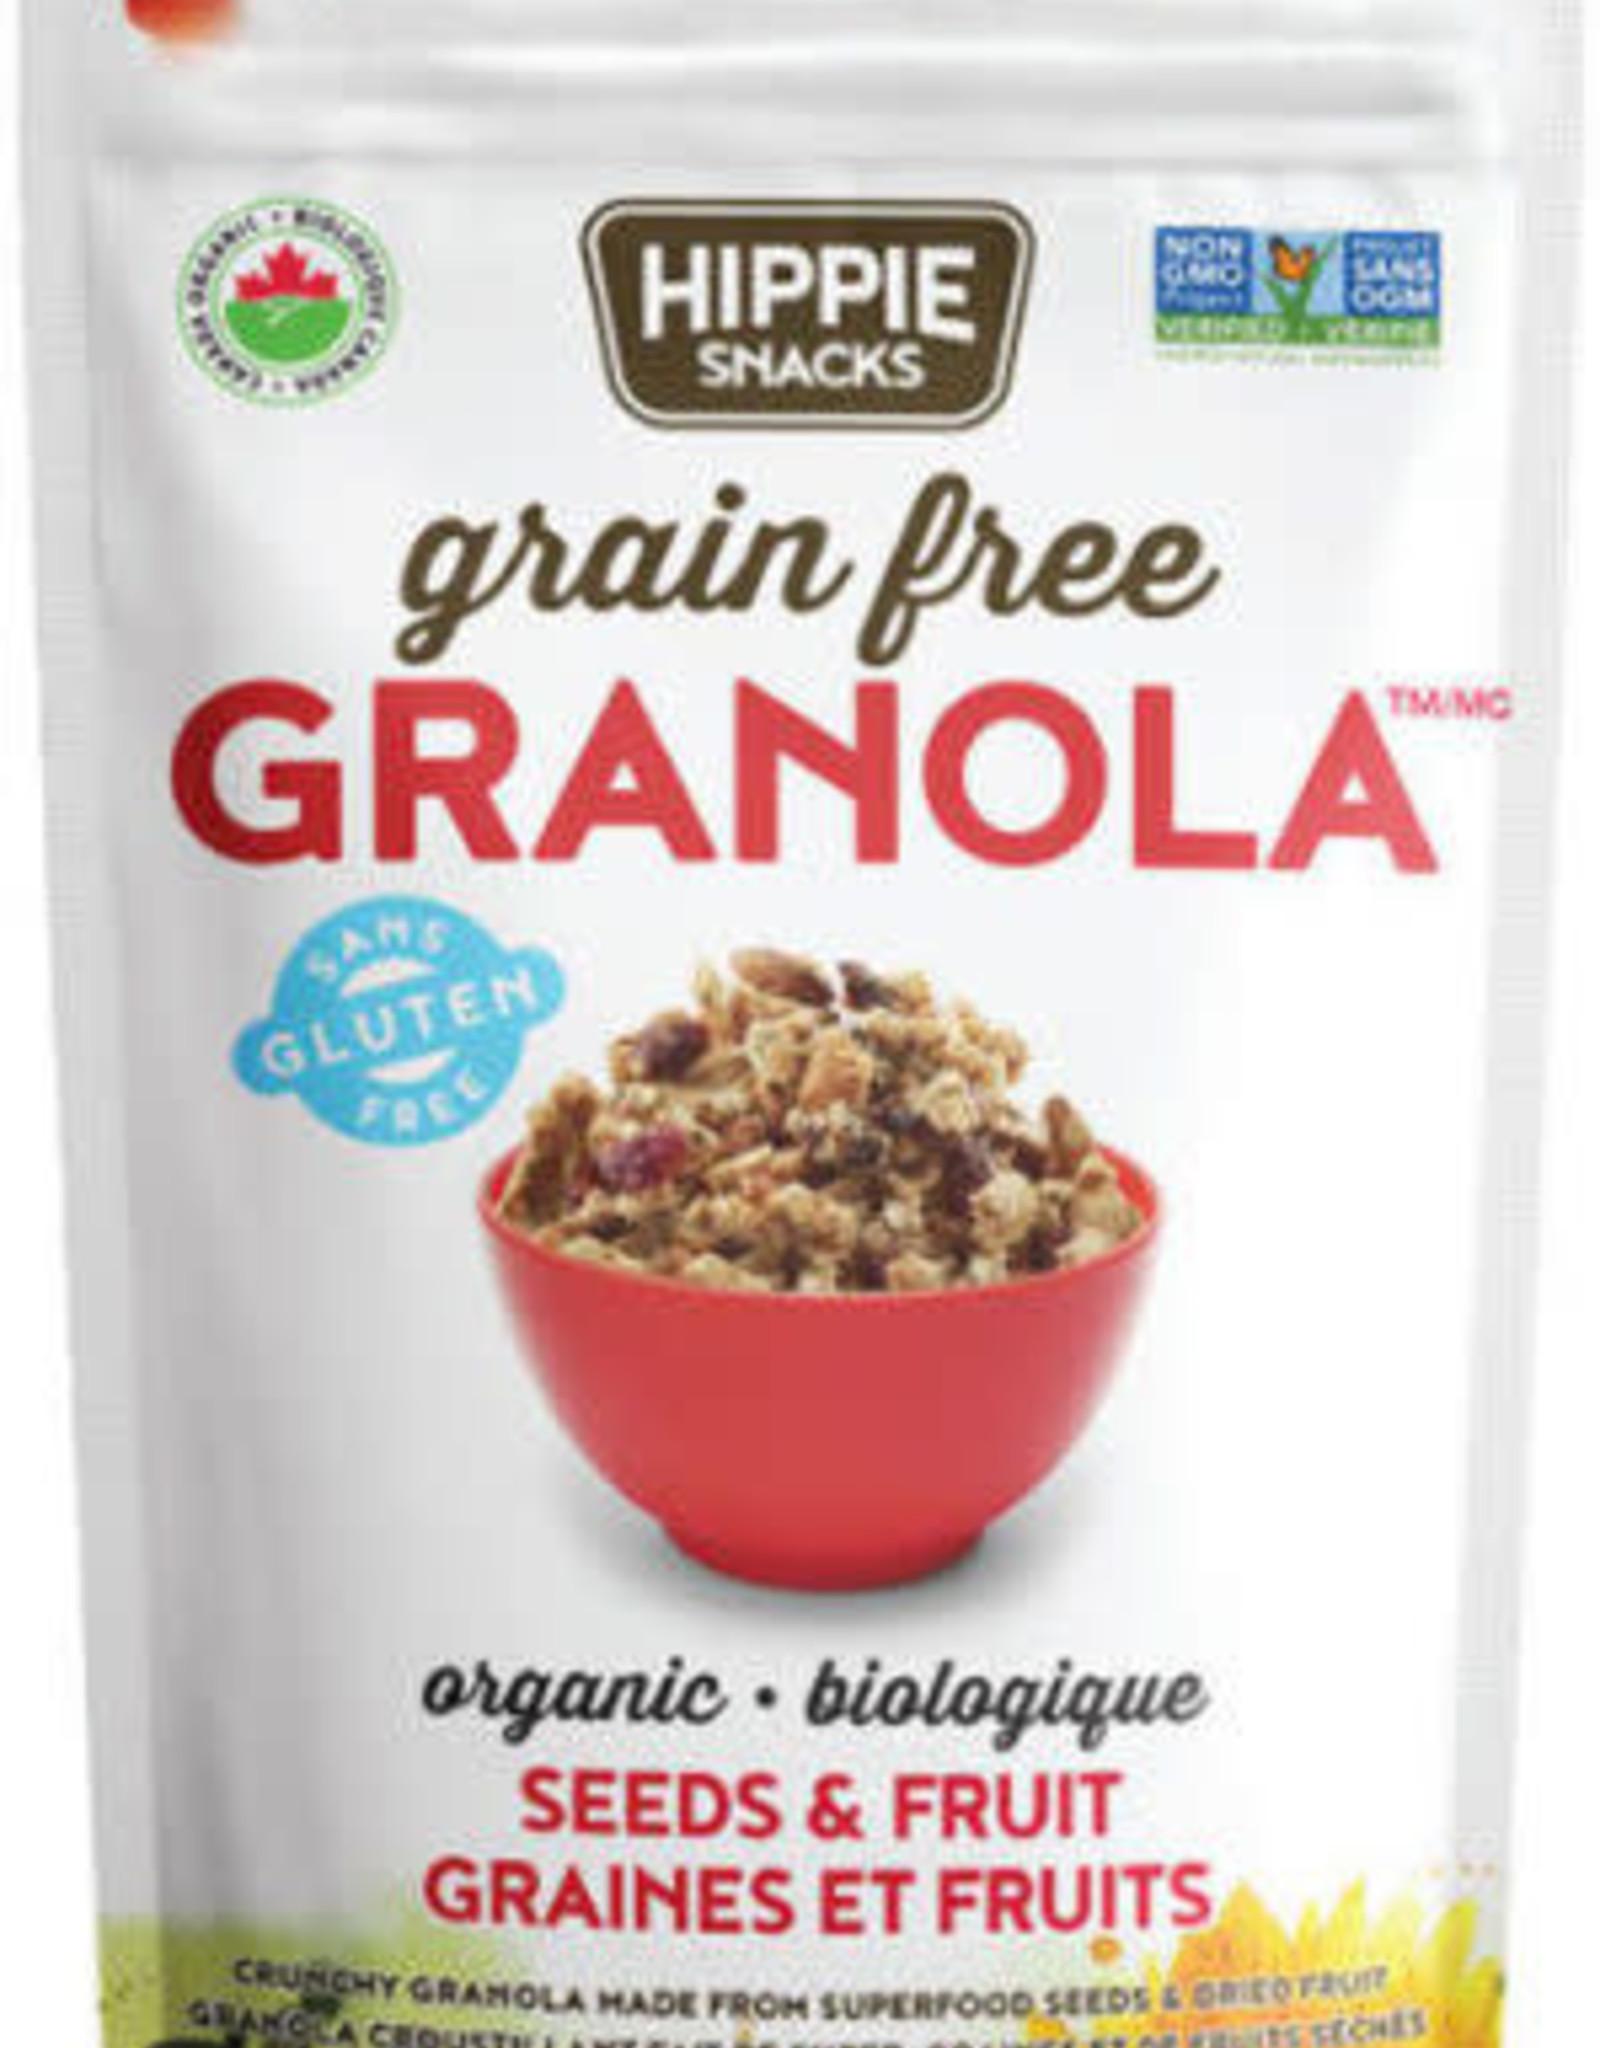 Hippie Snacks Hippie Snacks - Granola, Seeds & Fruit (220g)